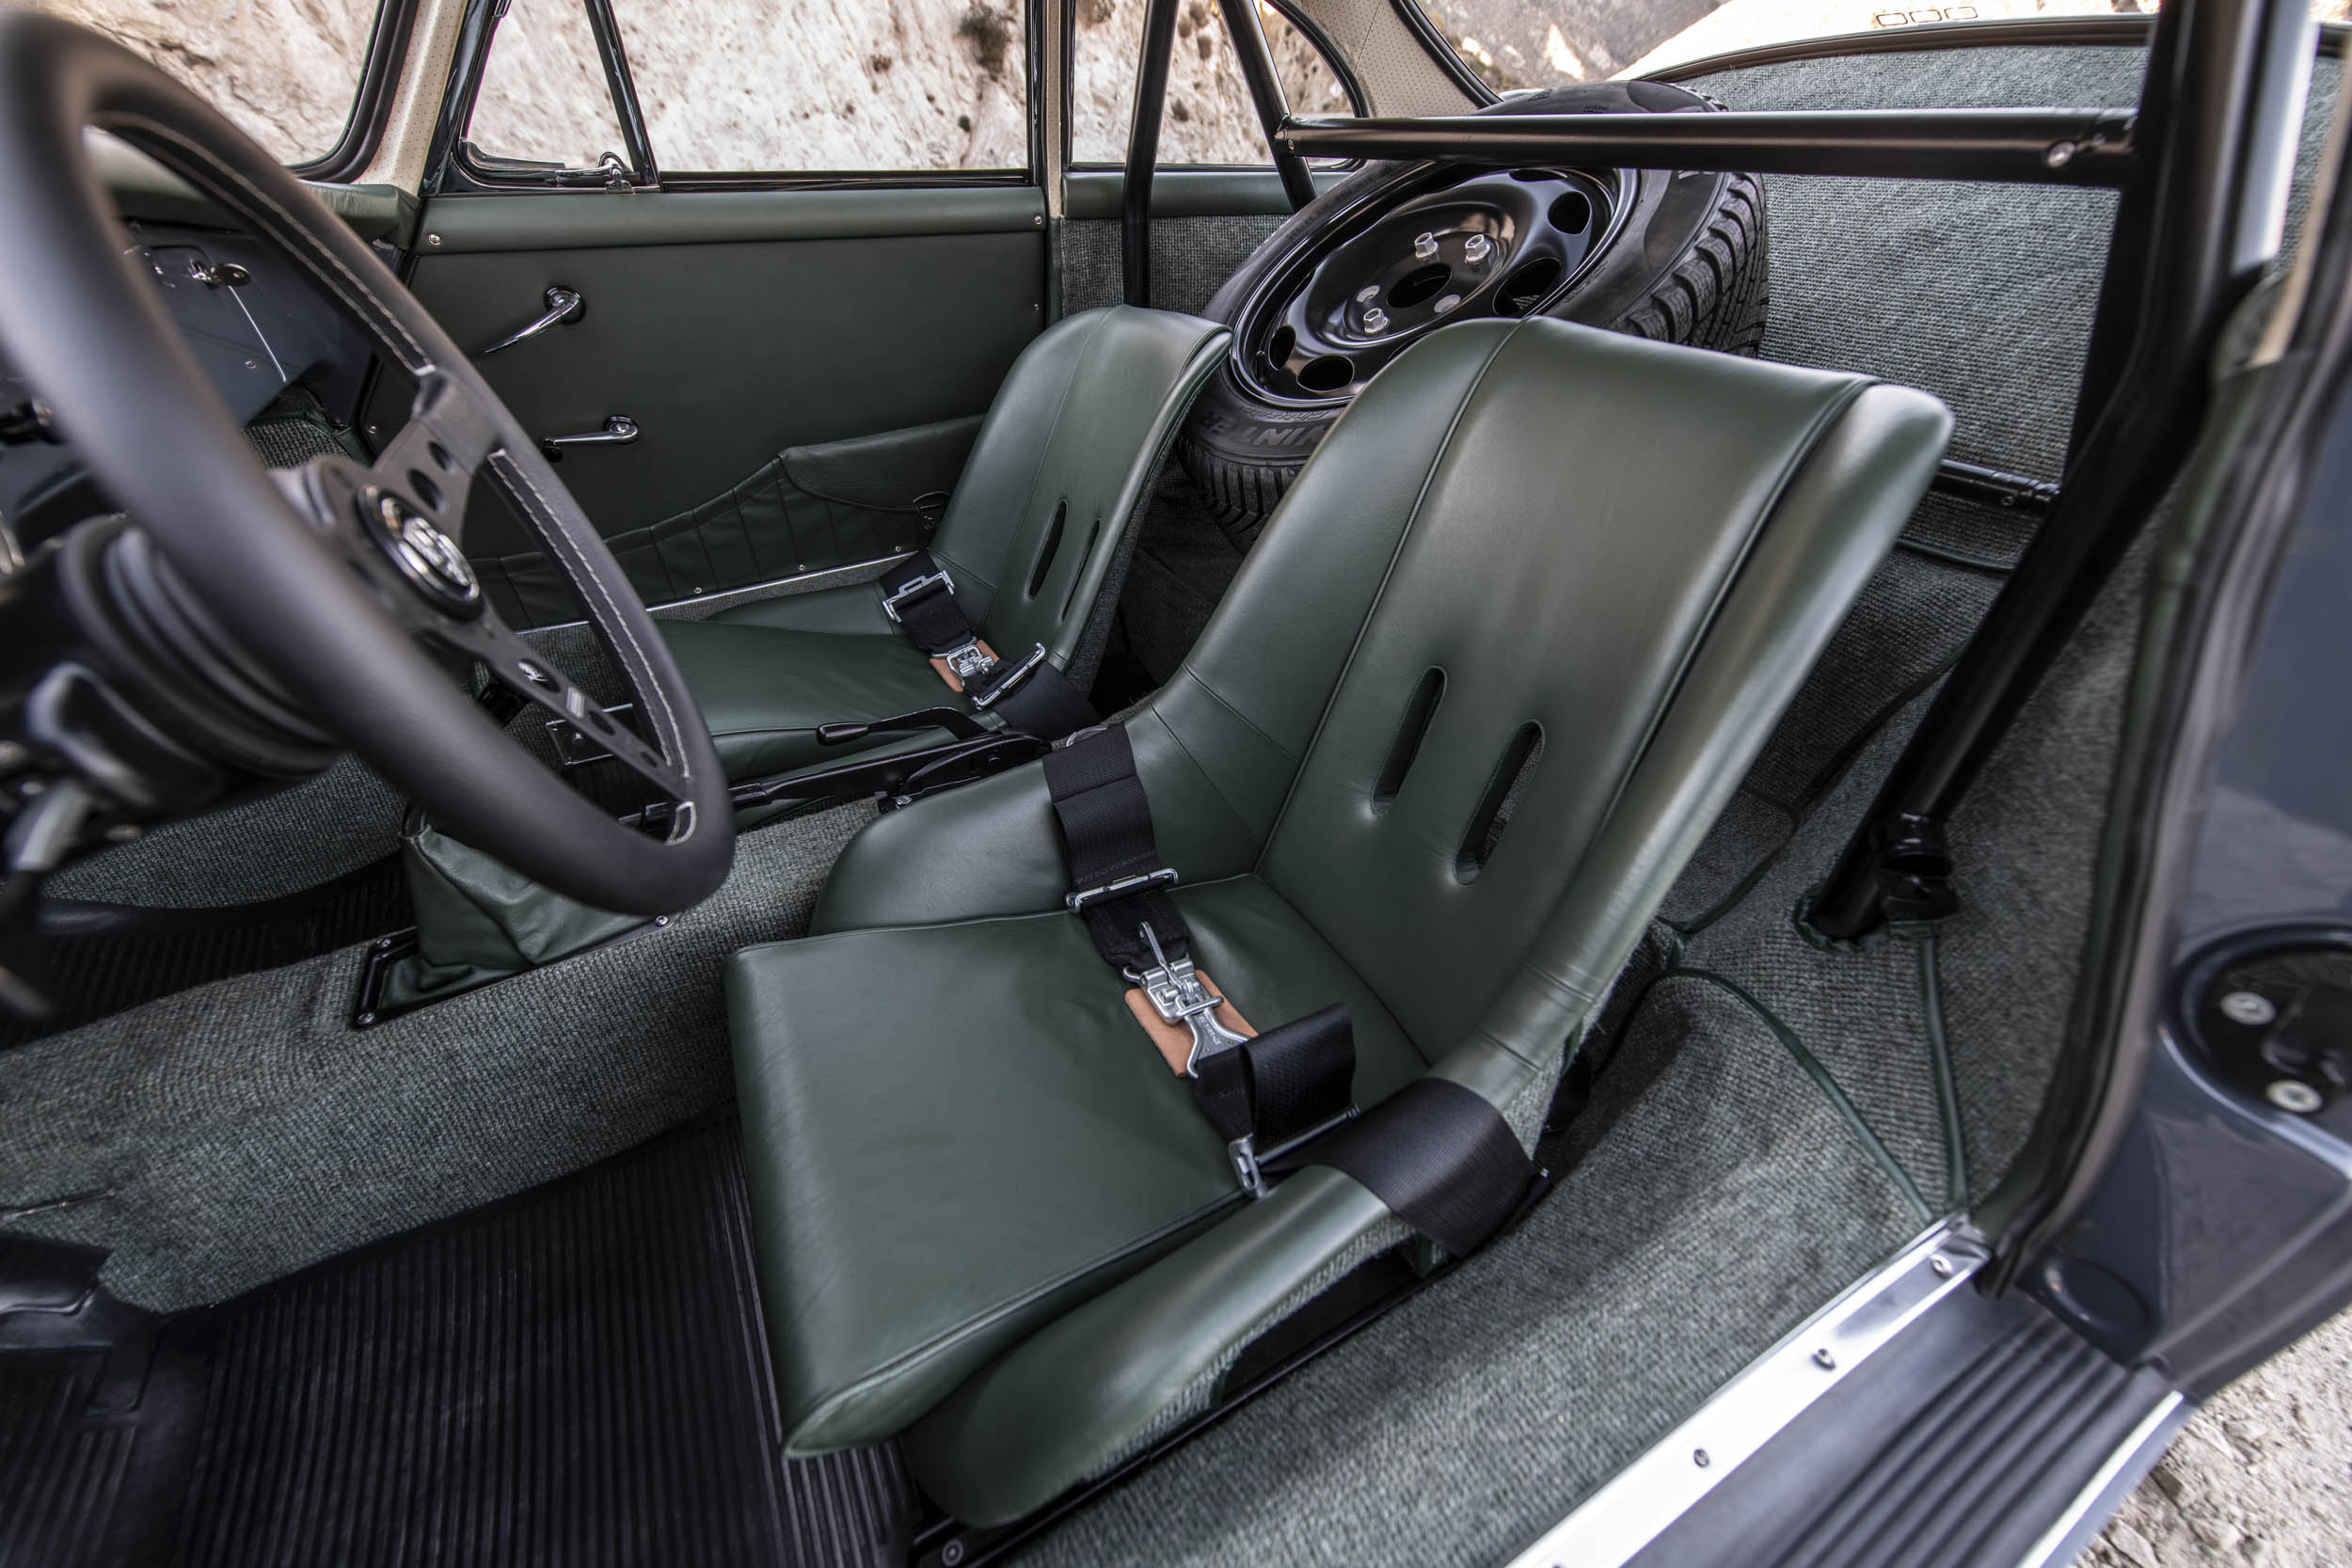 Emory Porsche 356 C4S Allrad seat detail